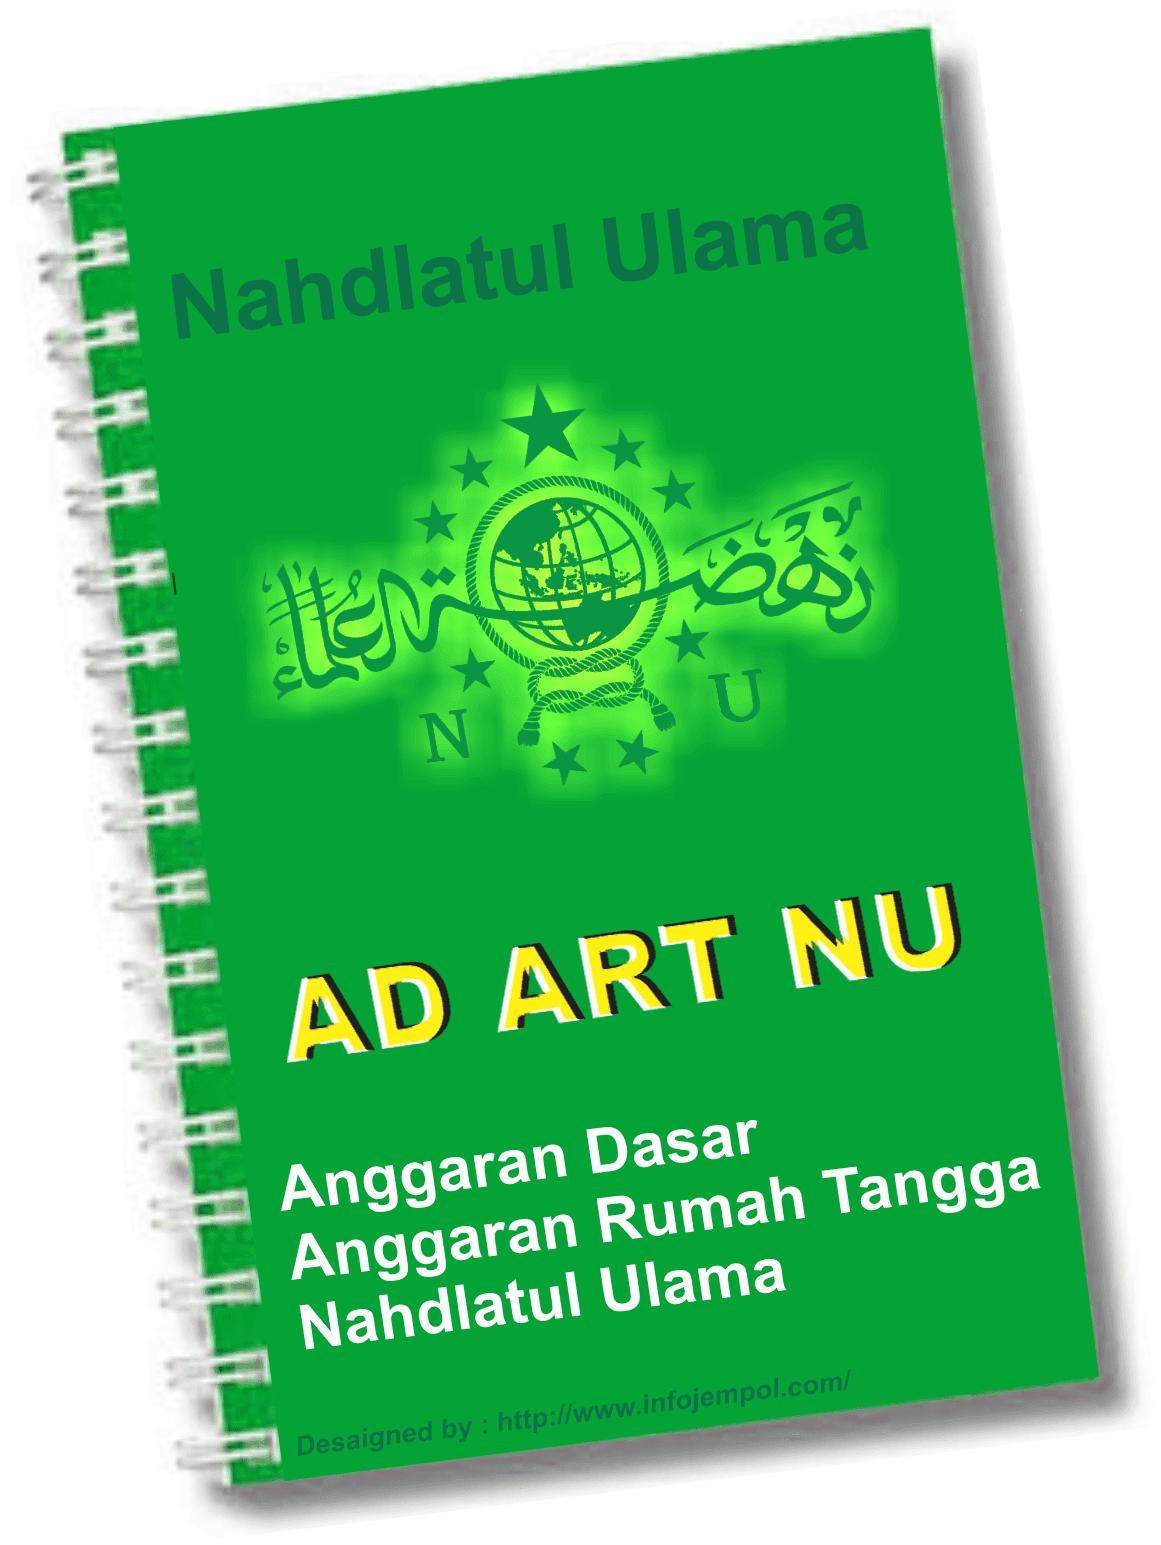 AD/ART Hasil Muktamar NU ke-33 Tahun 2015 di Jombang